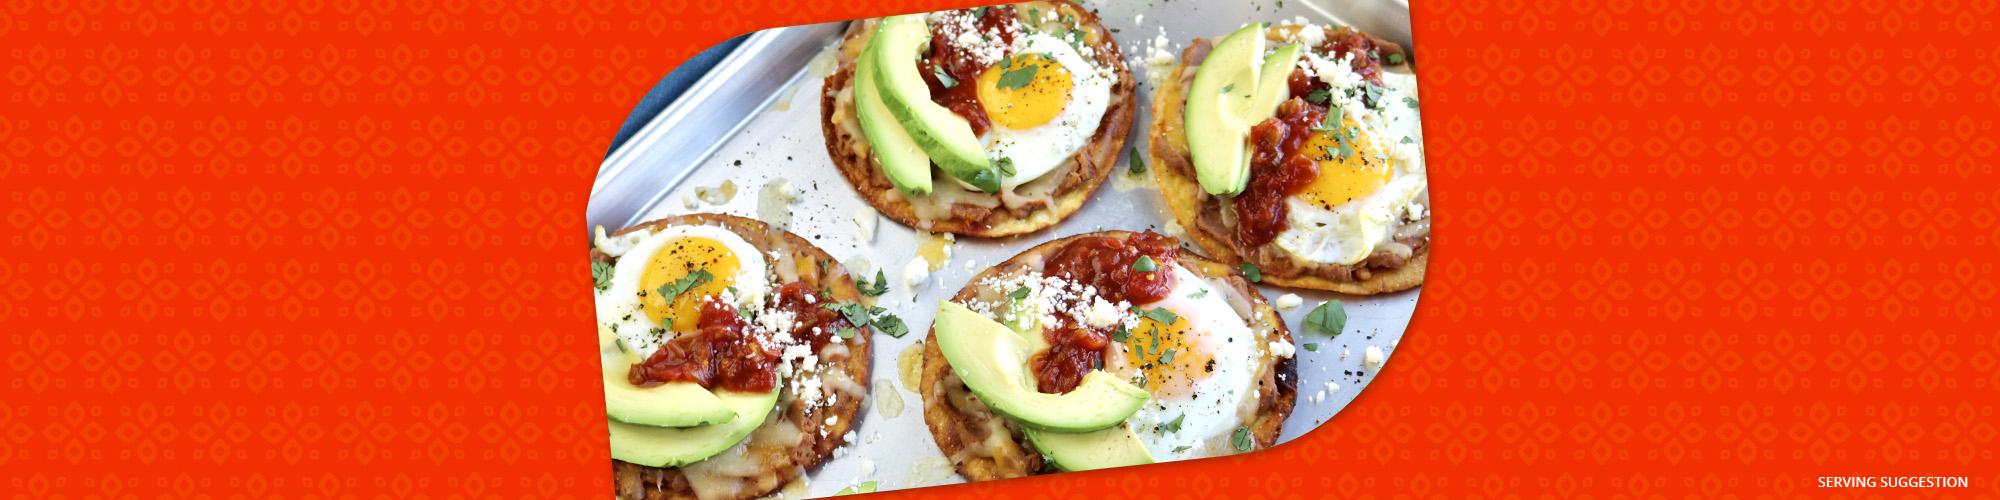 Salsas breakfast tostadas